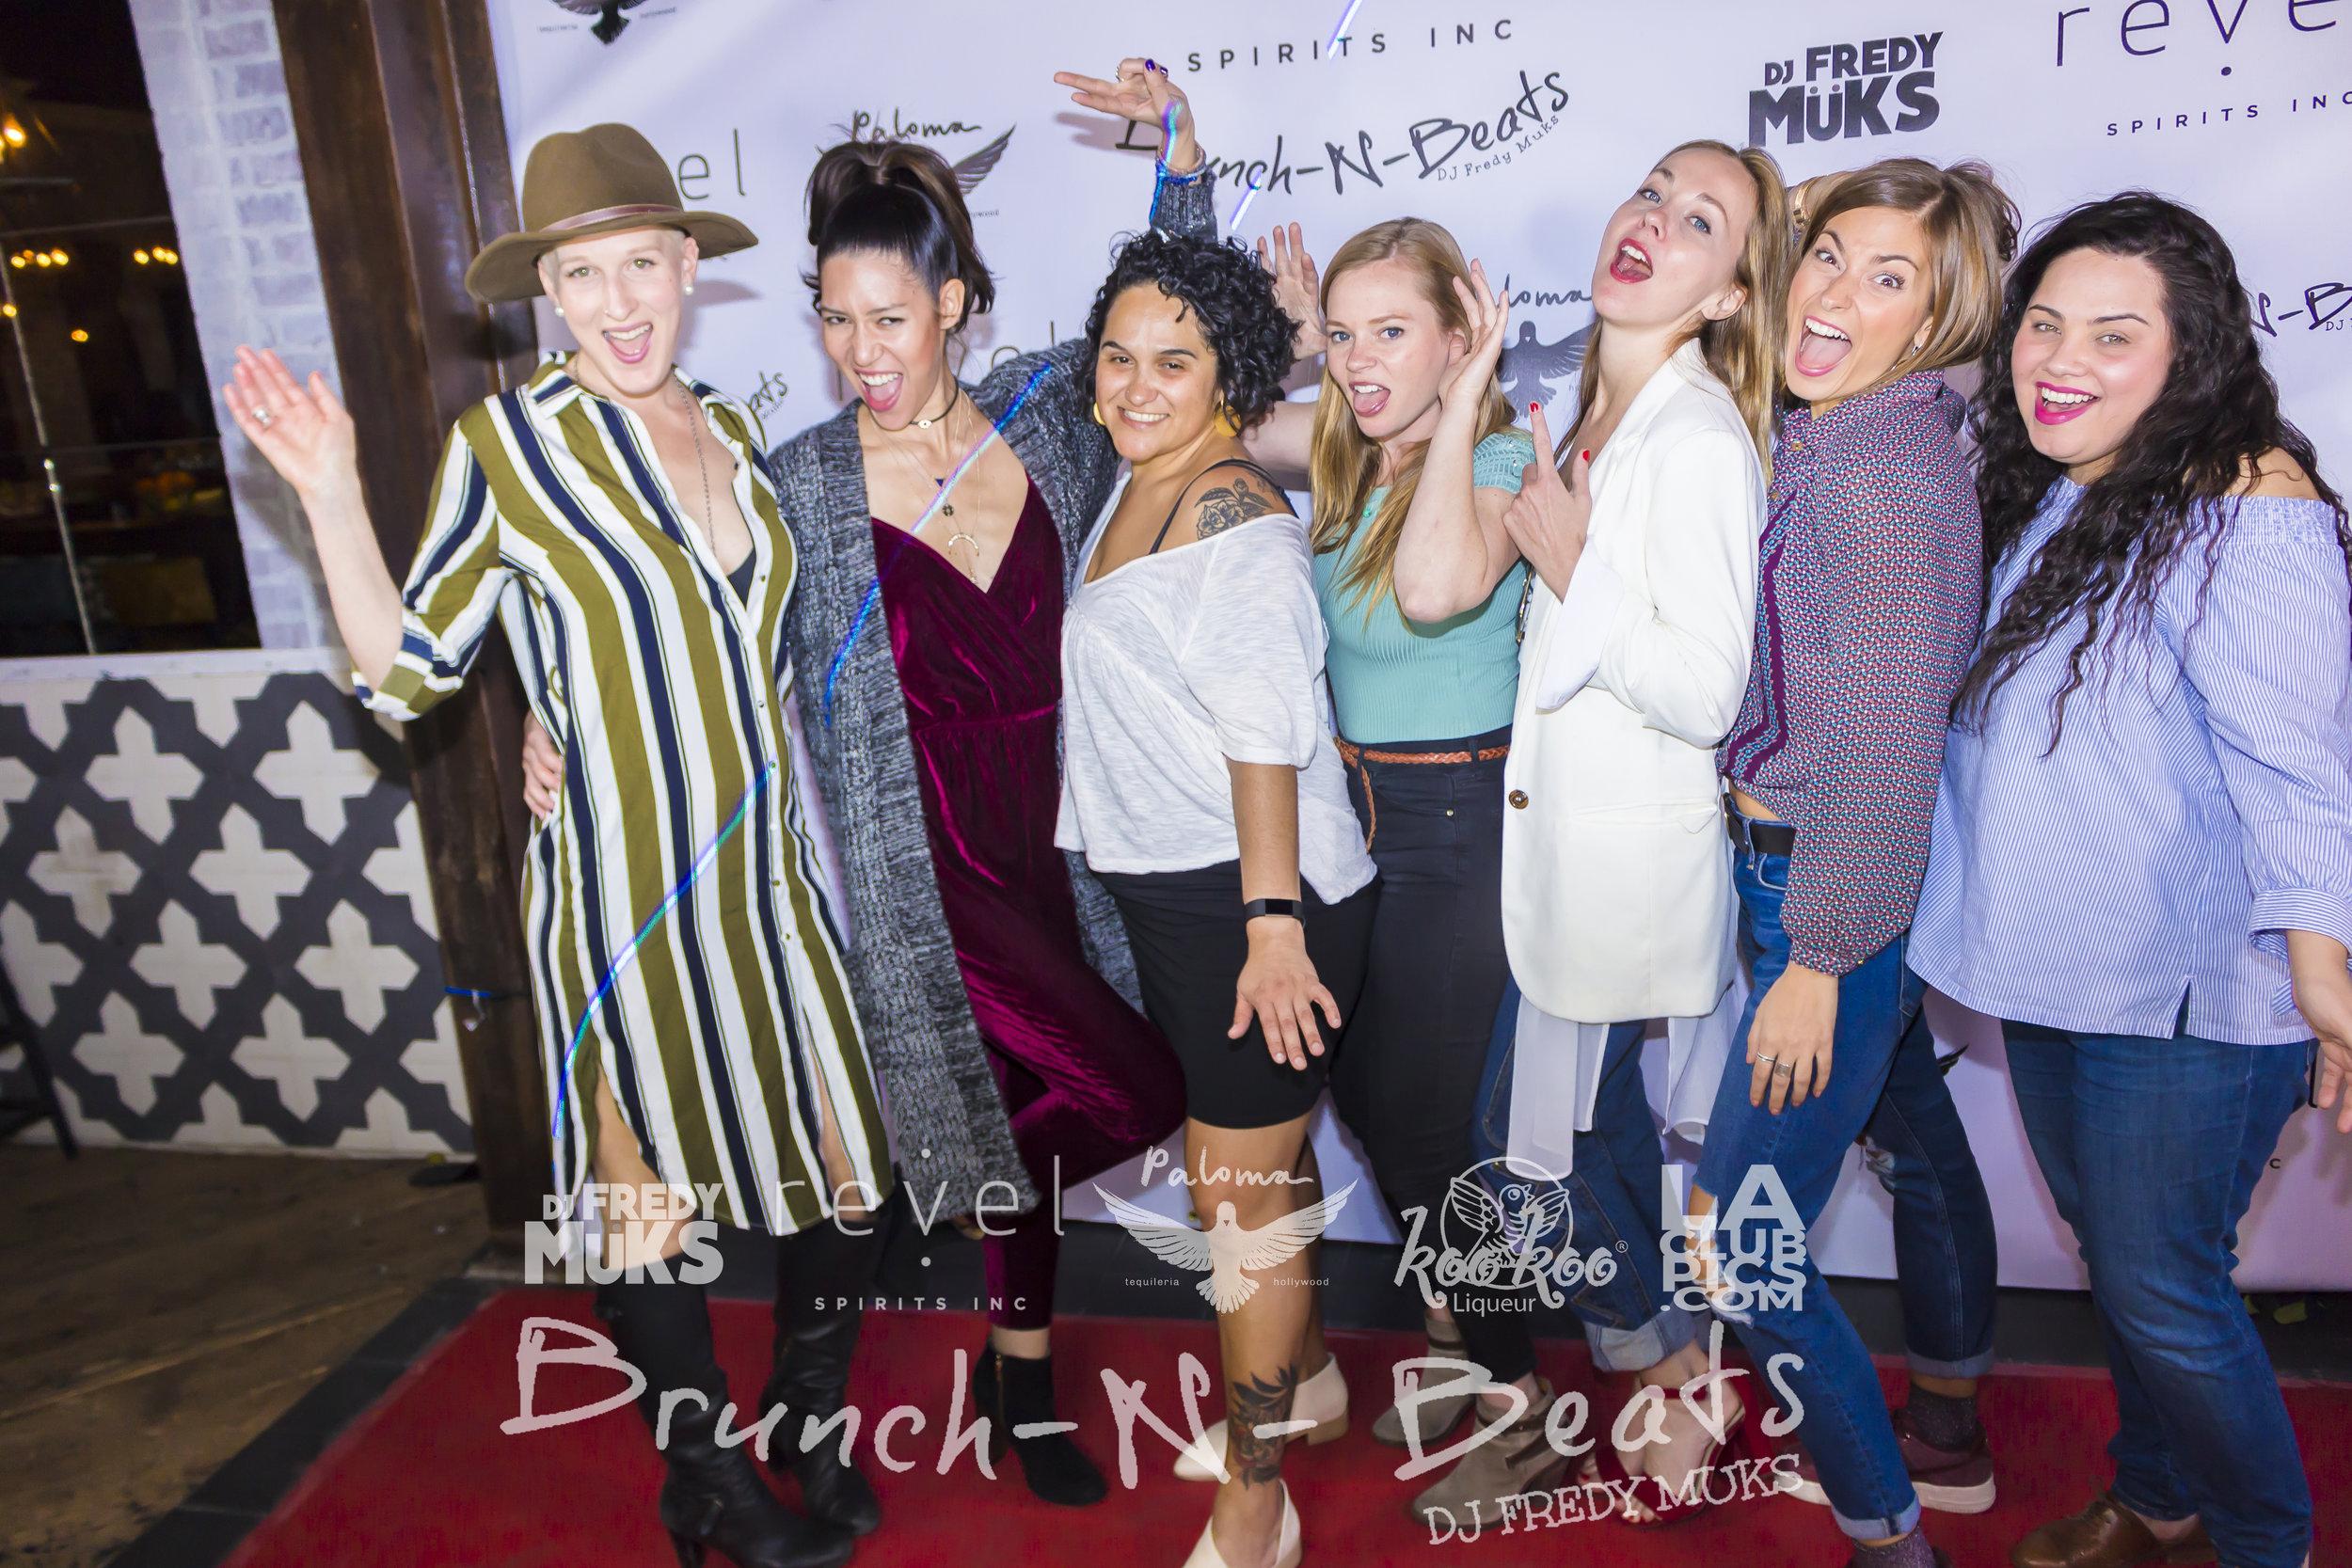 Brunch-N-Beats - Paloma Hollywood - 02-25-18_67.jpg